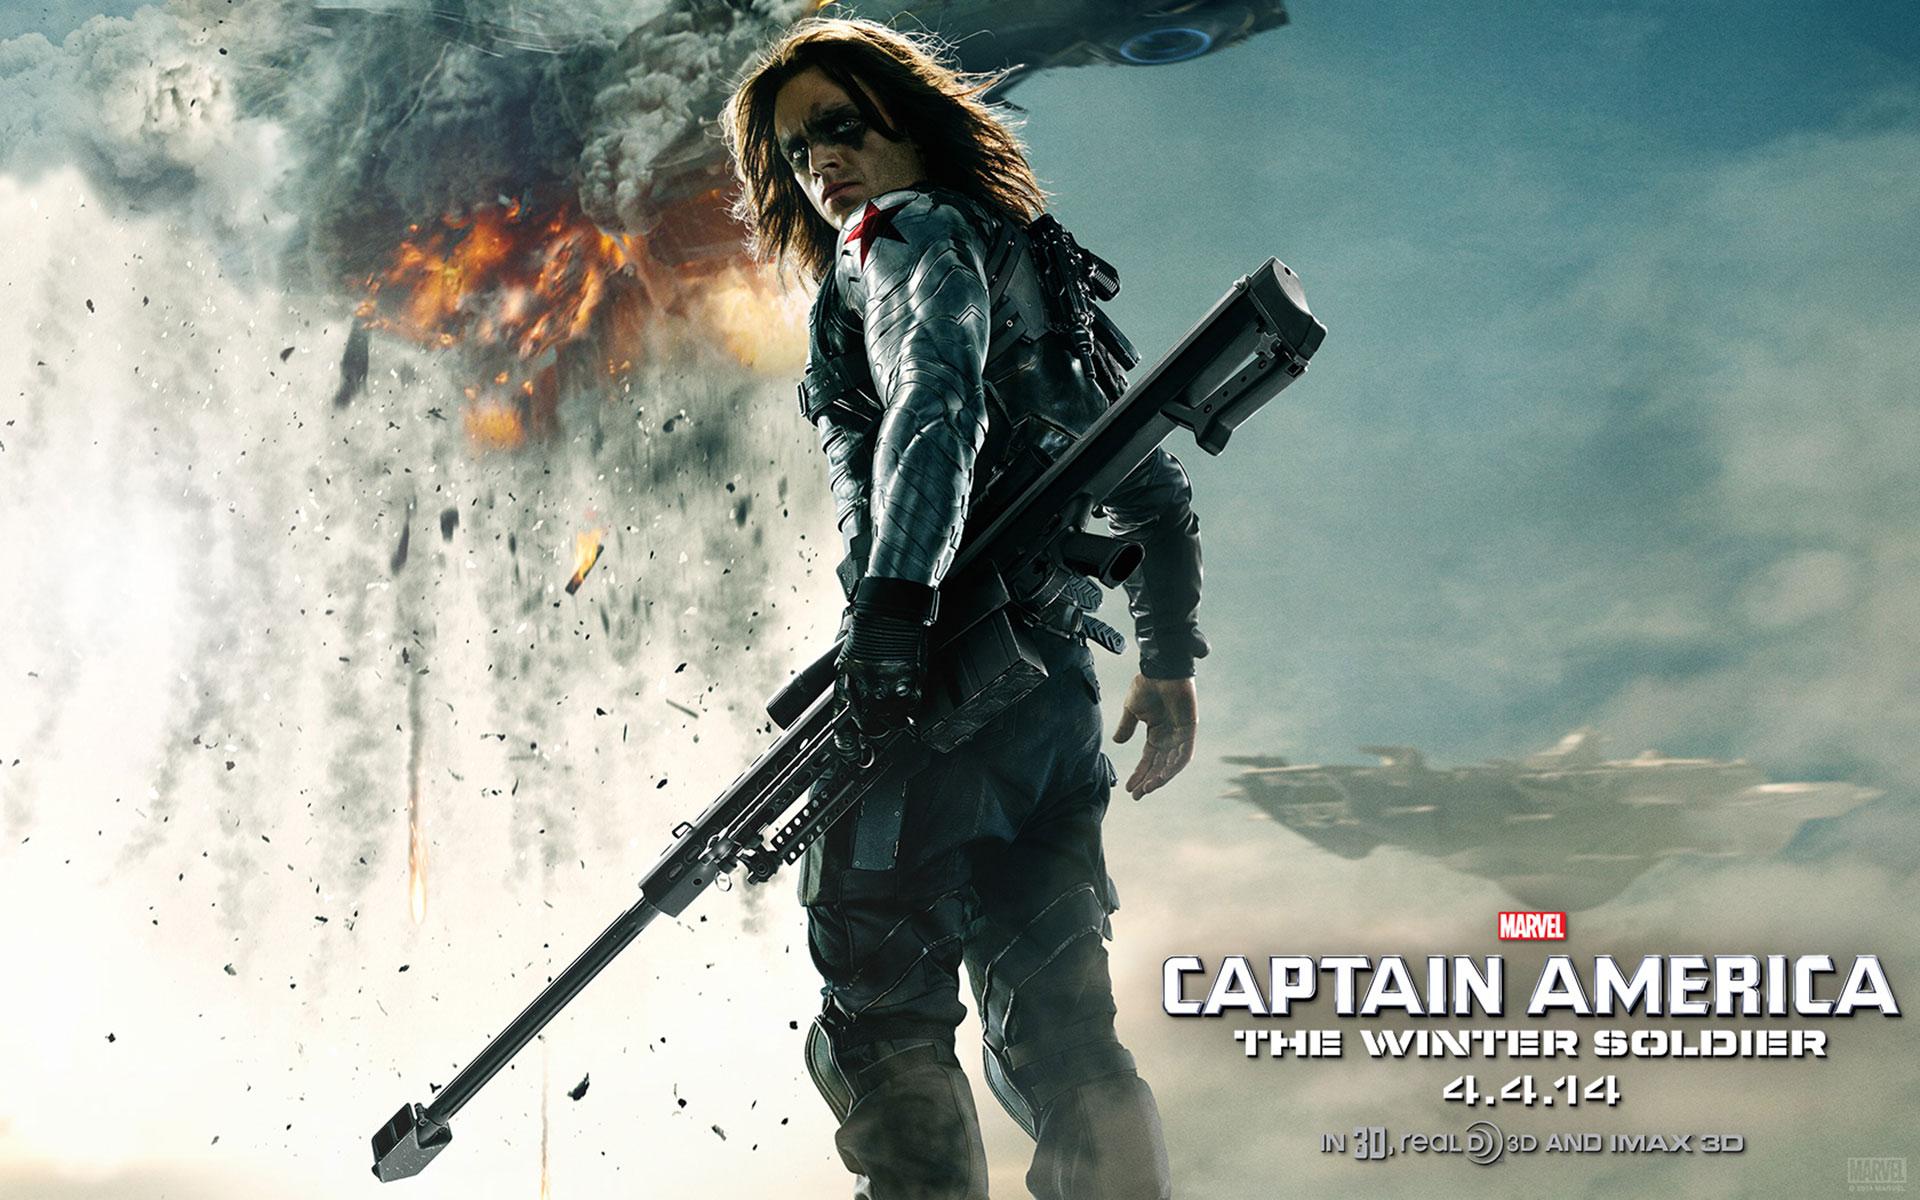 Captain America: The Winter Soldier Desktop wallpapers